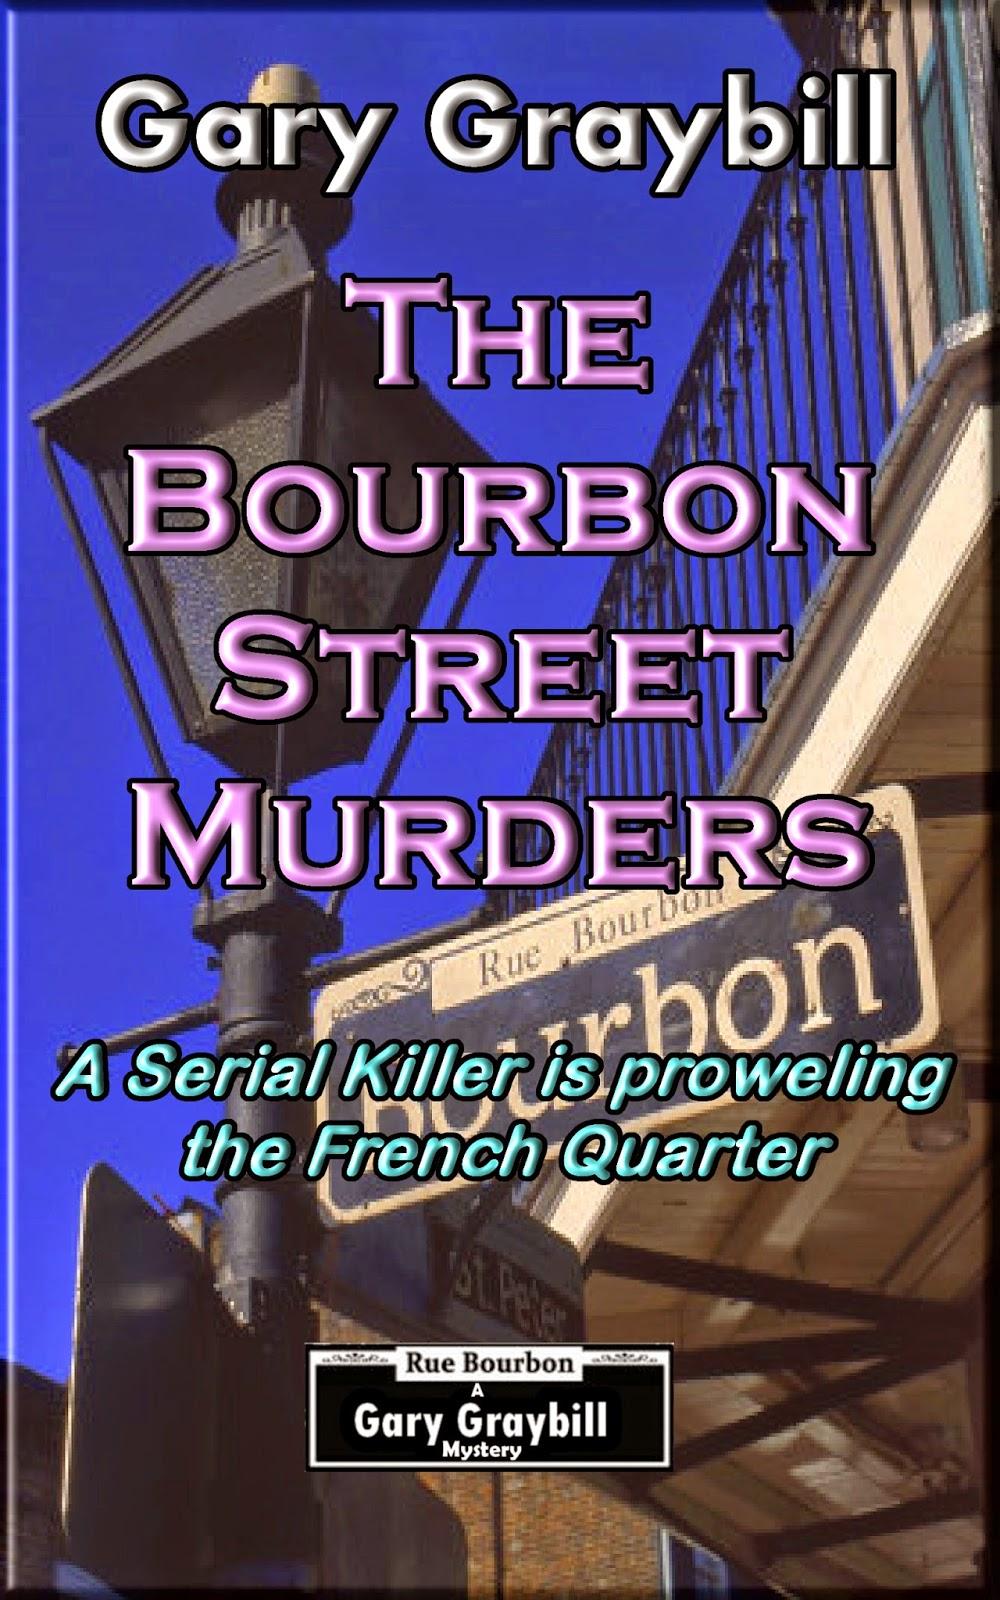 http://www.amazon.com/Bourbon-Street-Murders-proweling-Quarter/dp/1508865647/ref=sr_1_1?ie=UTF8&qid=1426394442&sr=8-1&keywords=Gary+Graybill